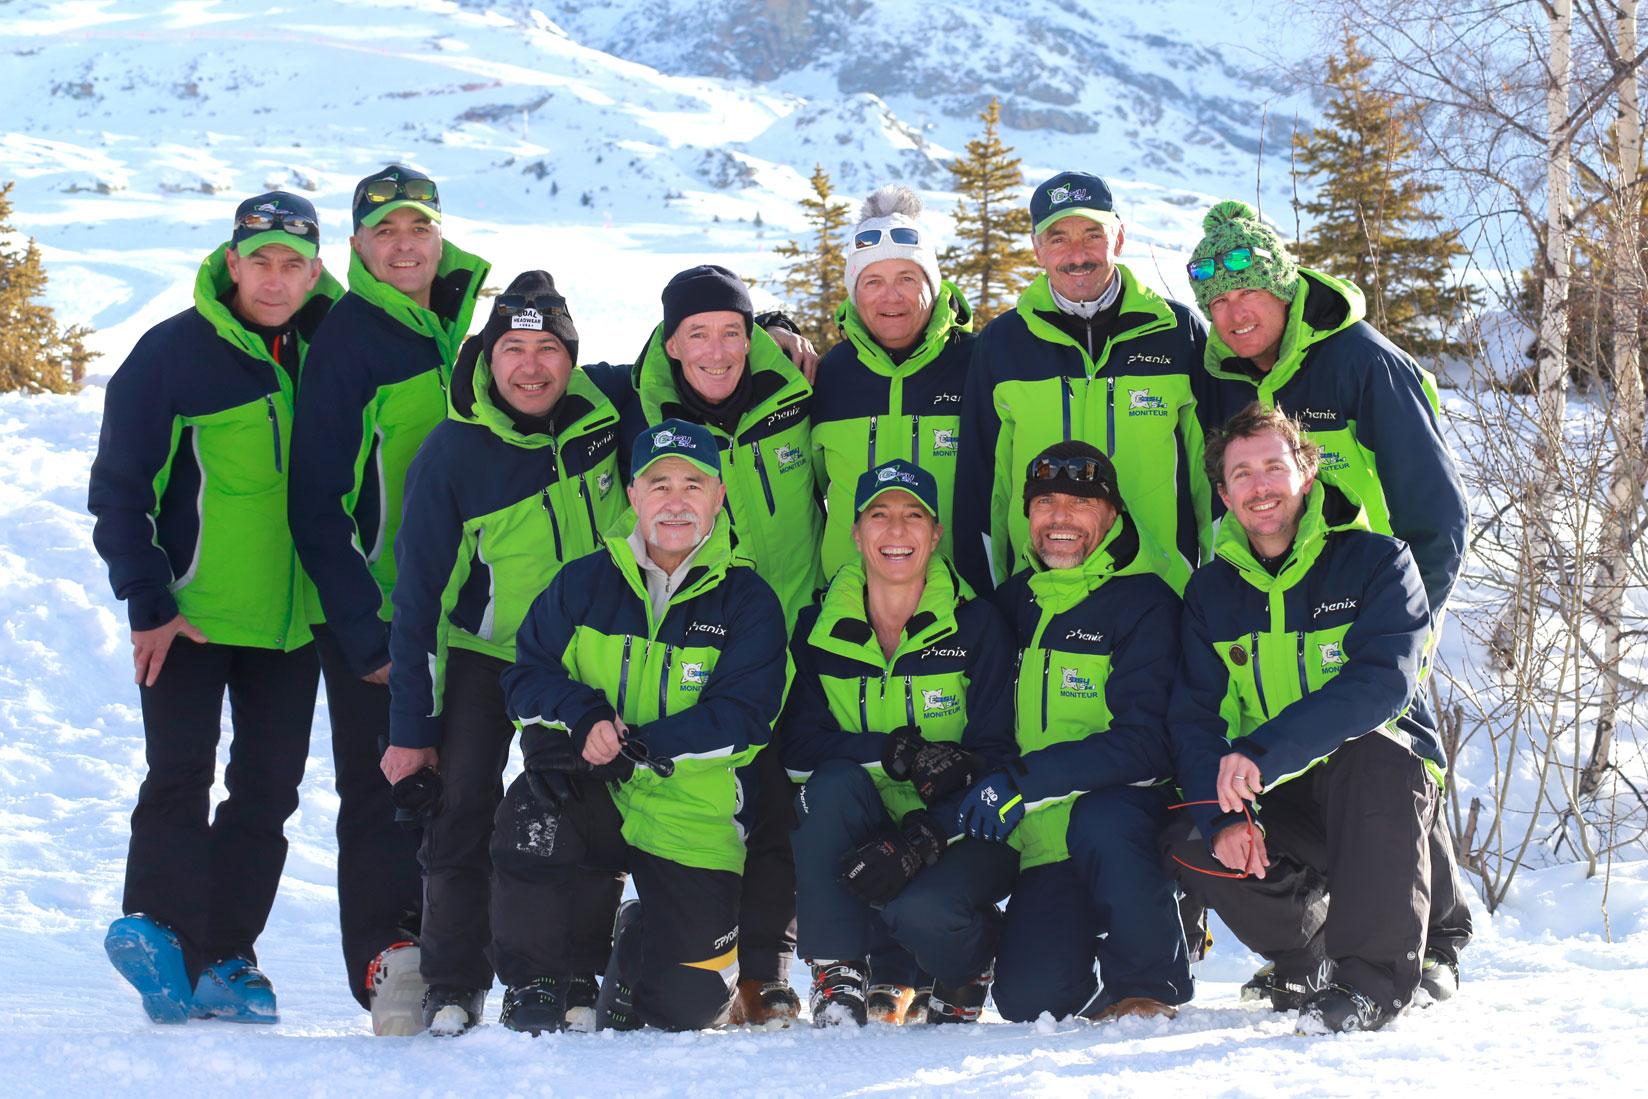 Easyski Alpe d'Huez 2